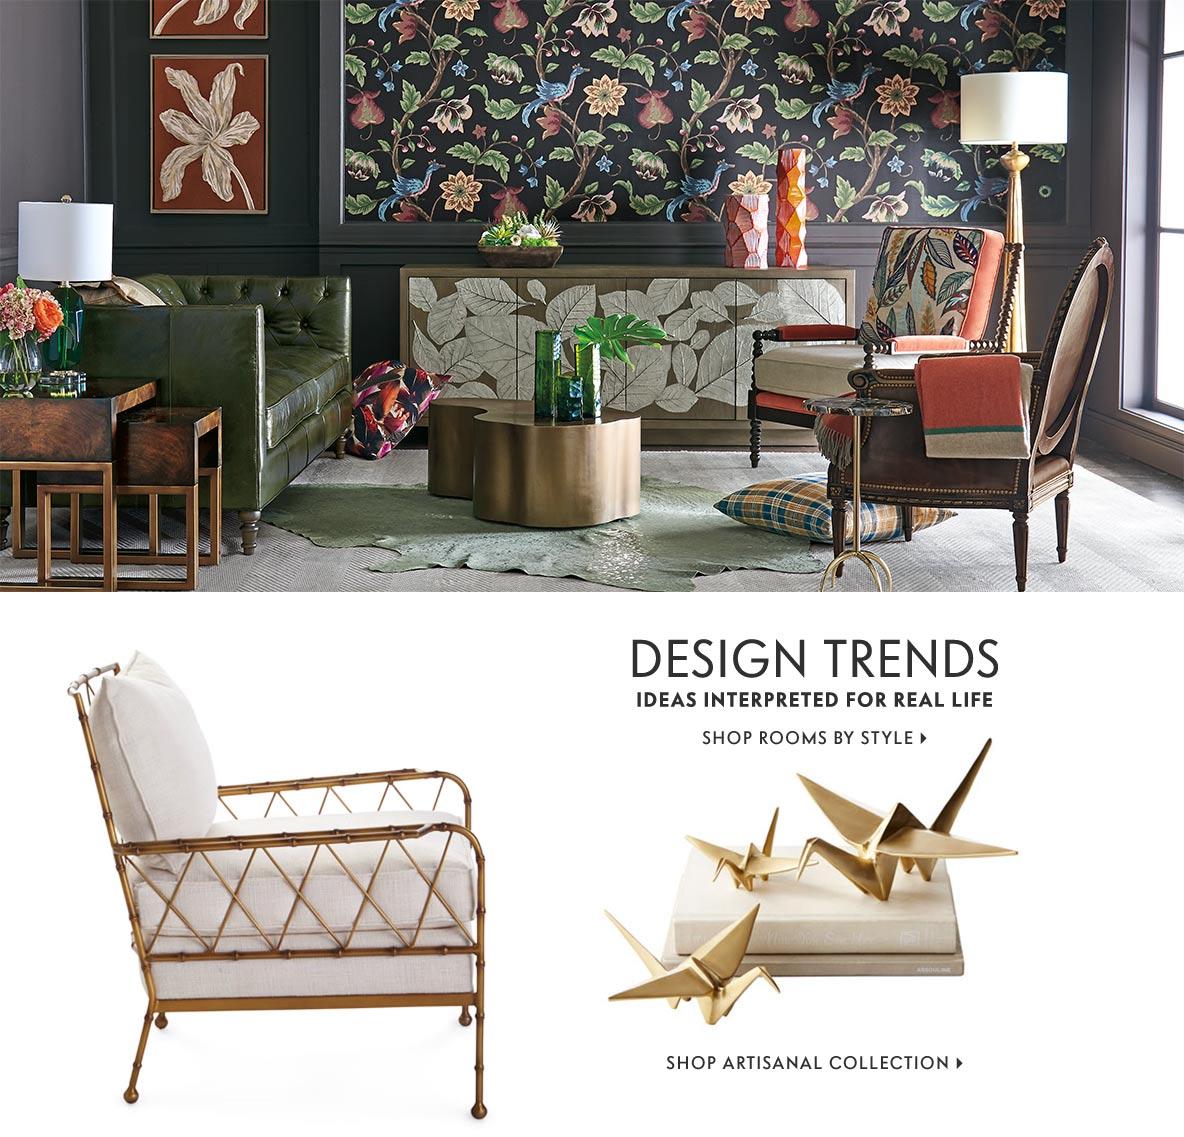 Furniture Furnishings: Dinnerware, Bedroom Furniture, Chandeliers & Sectional